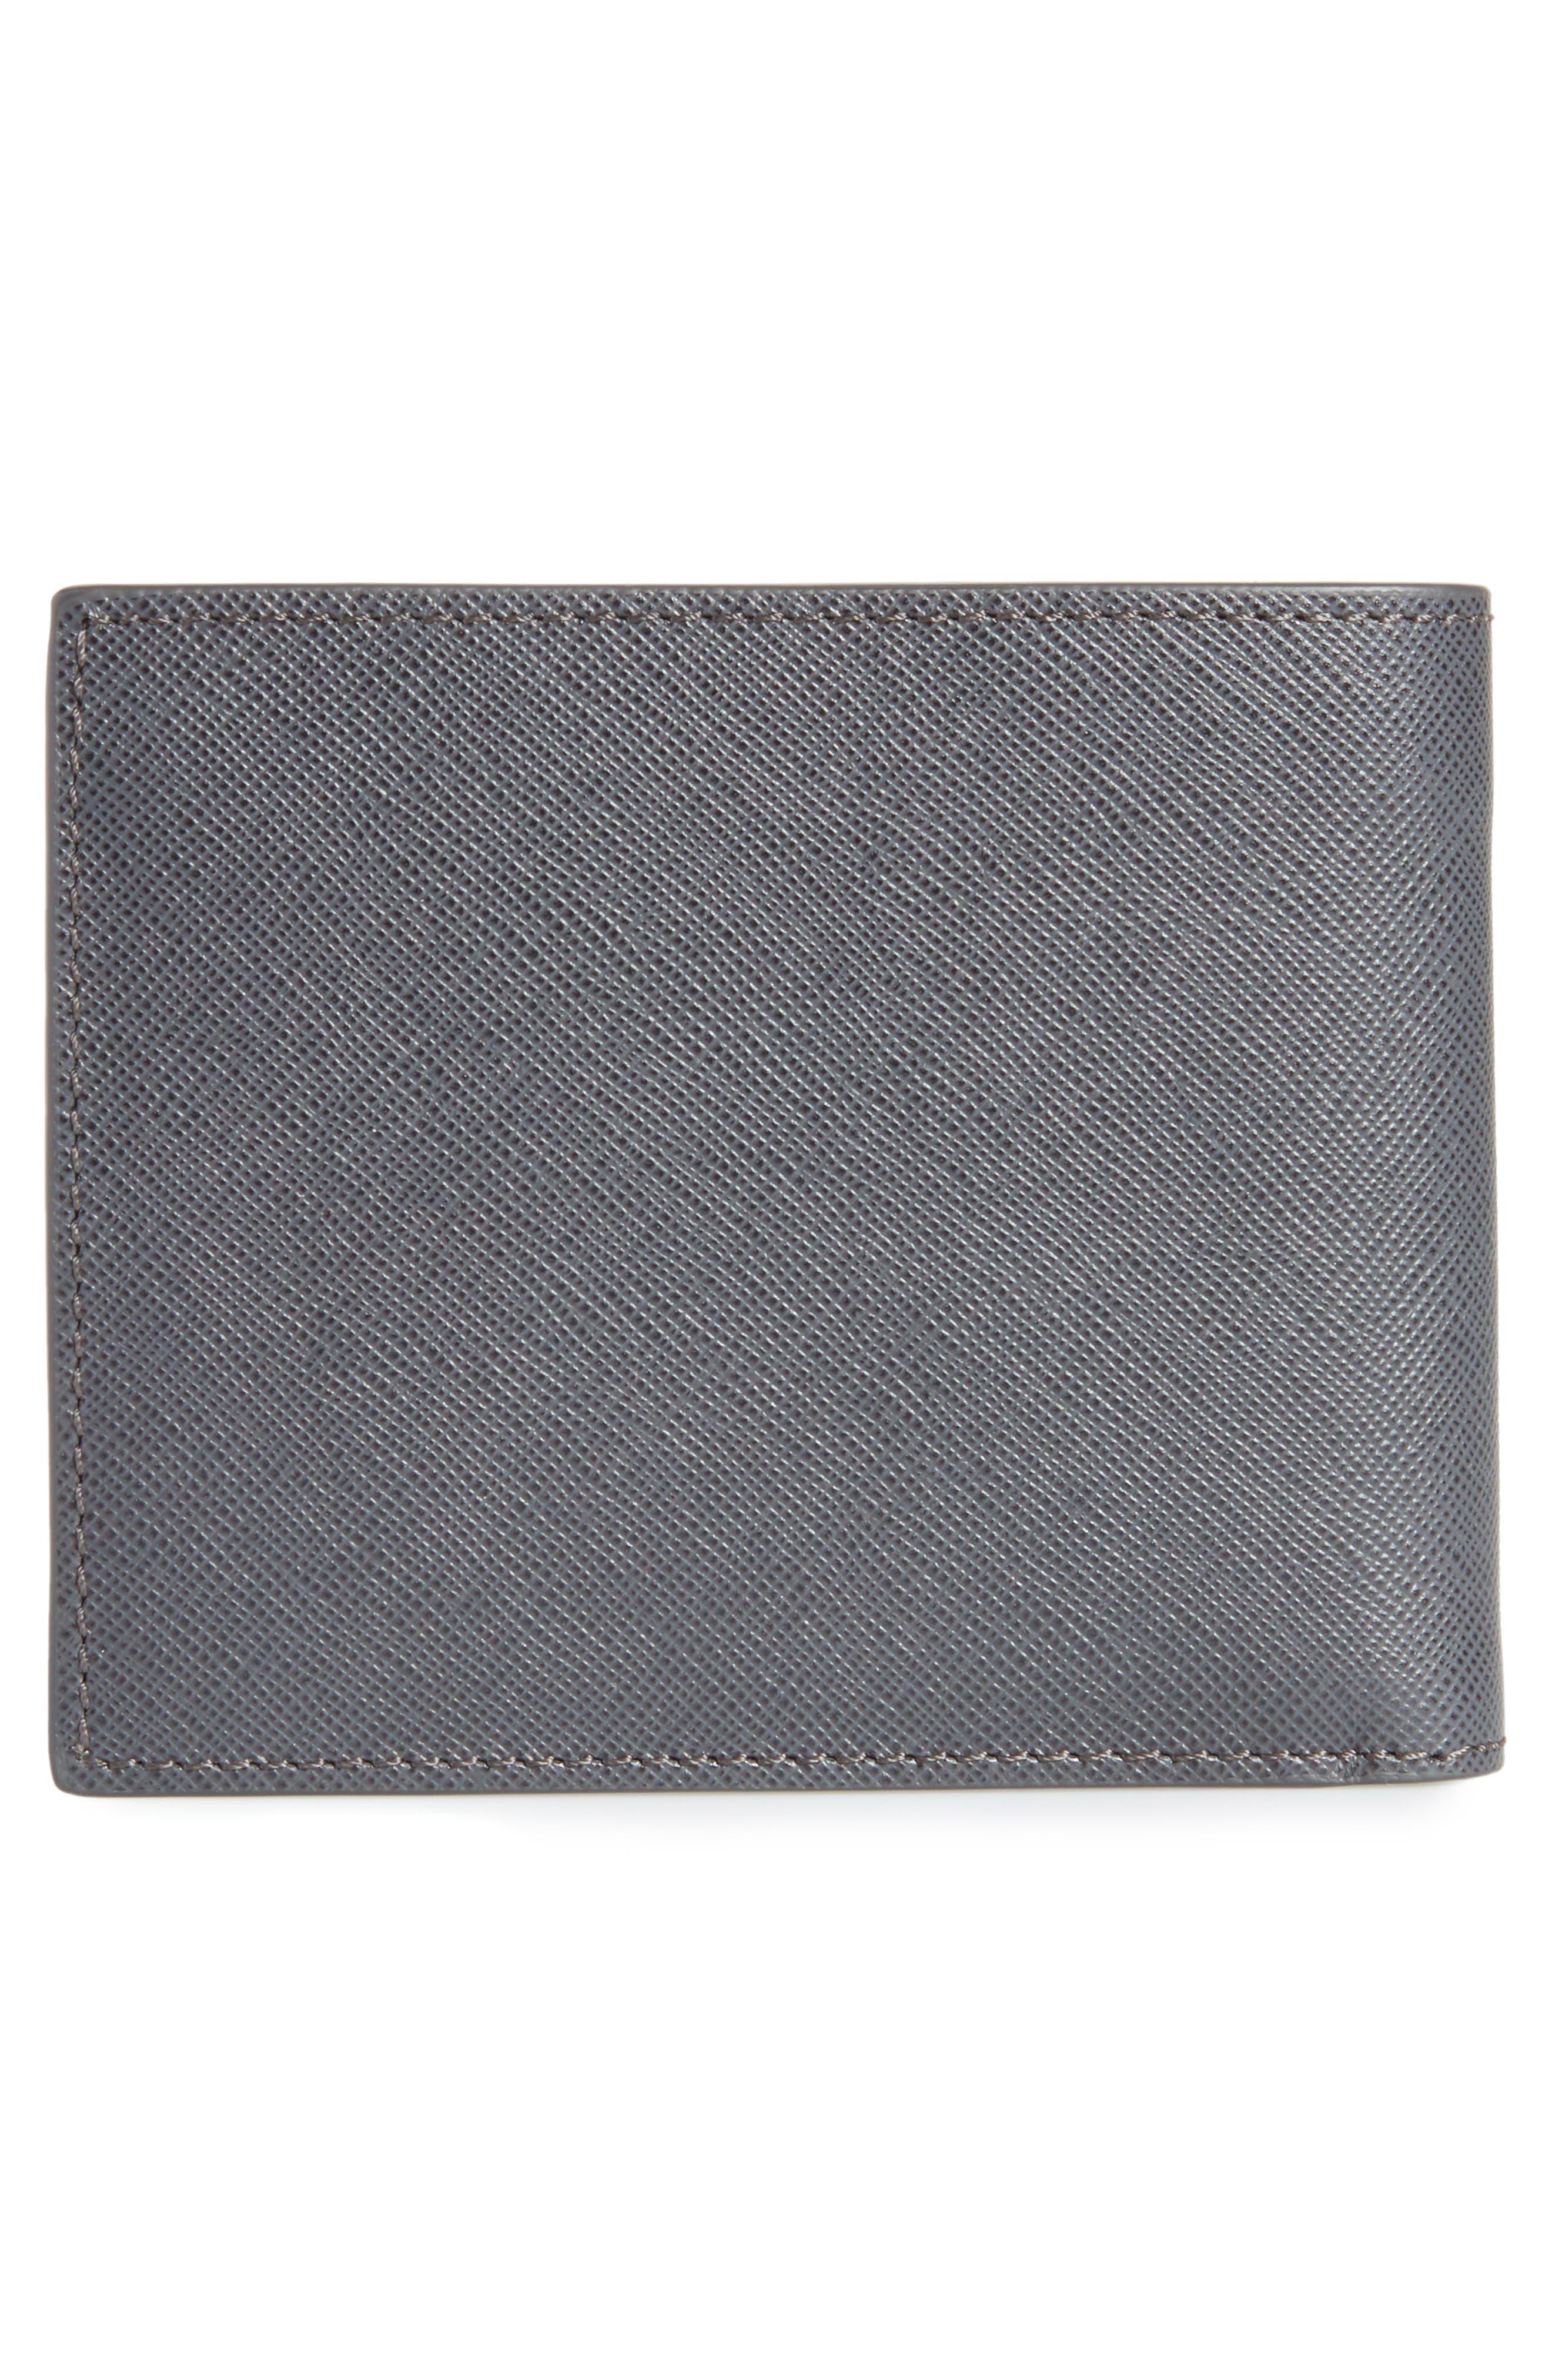 Sartorial Leather Bifold Wallet,                             Alternate thumbnail 3, color,                             DARK GREY